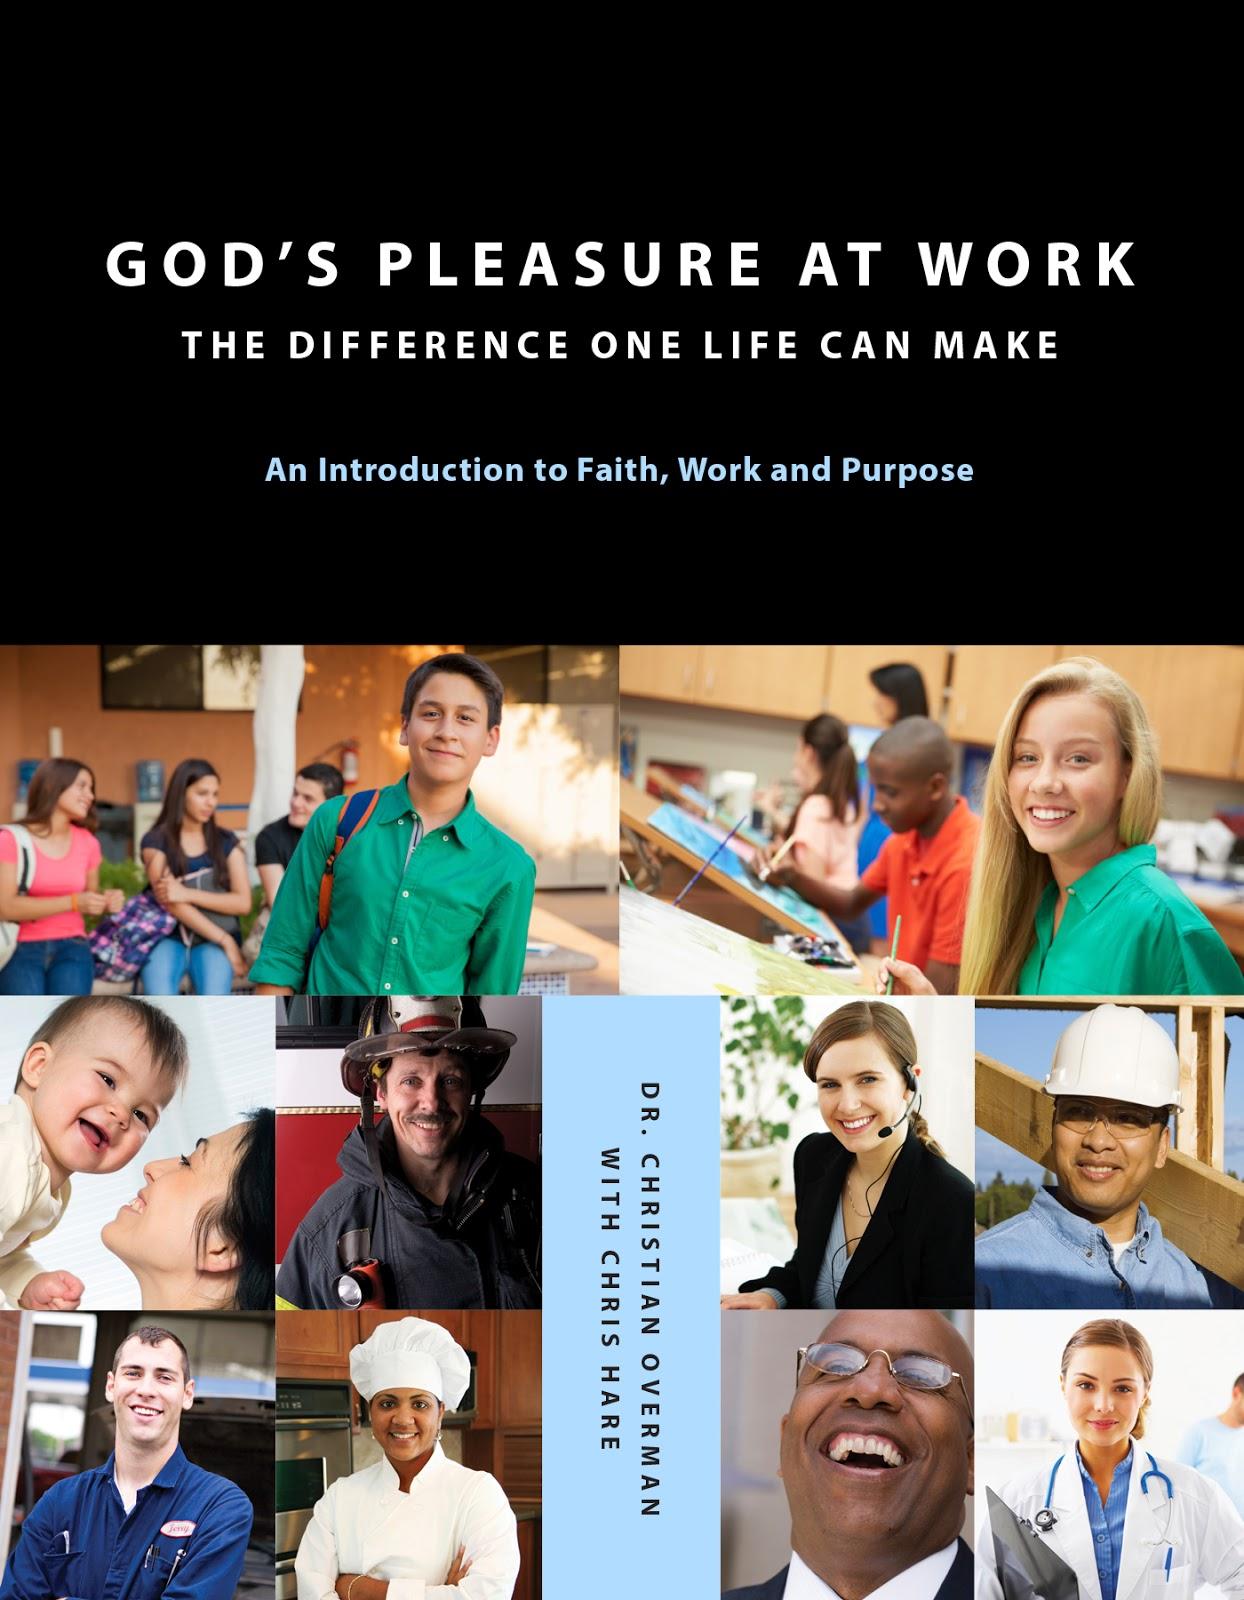 God's Pleasure at Work